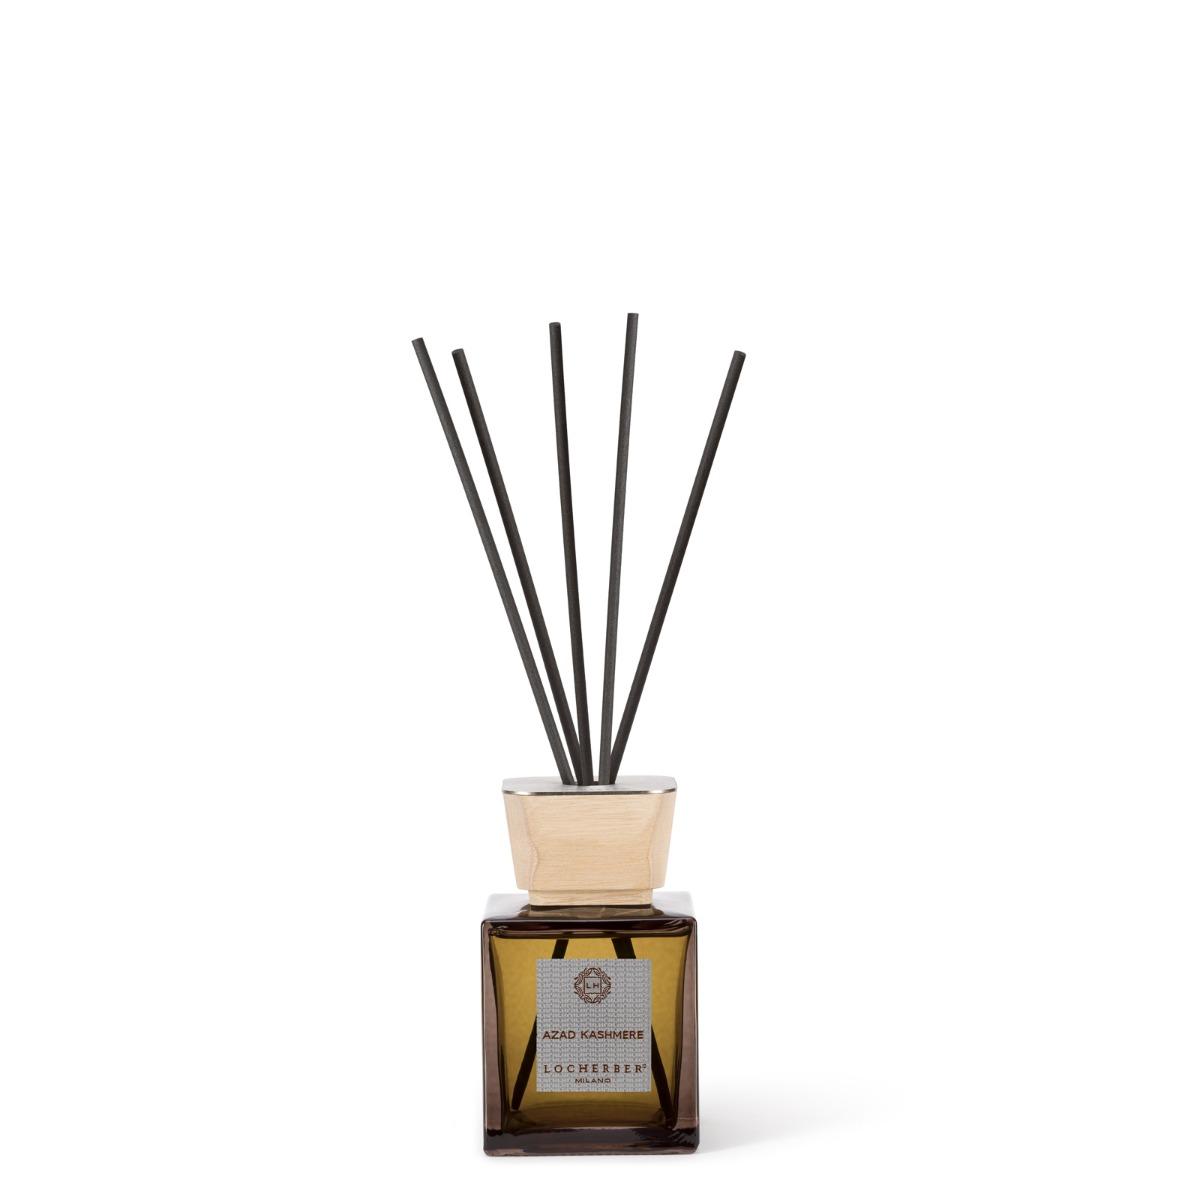 Dyfuzor zapachu Azad Kashmere 250ml Miloo Home LCH-440188